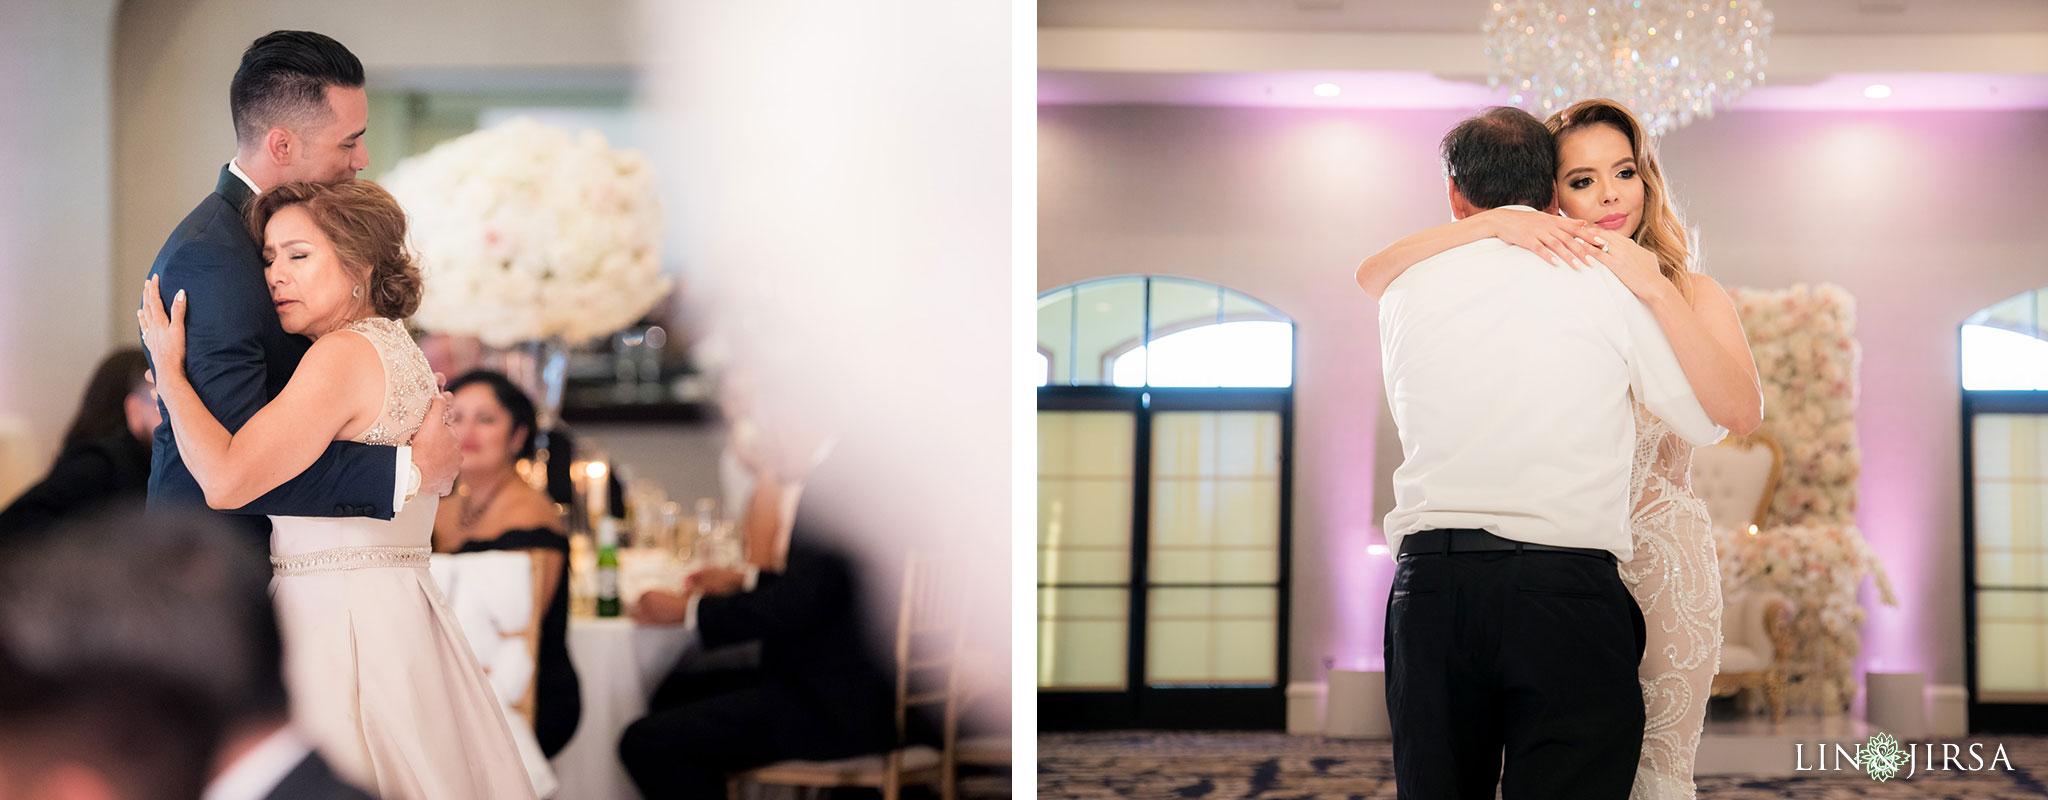 33 trump national golf course palos verdes wedding reception photography